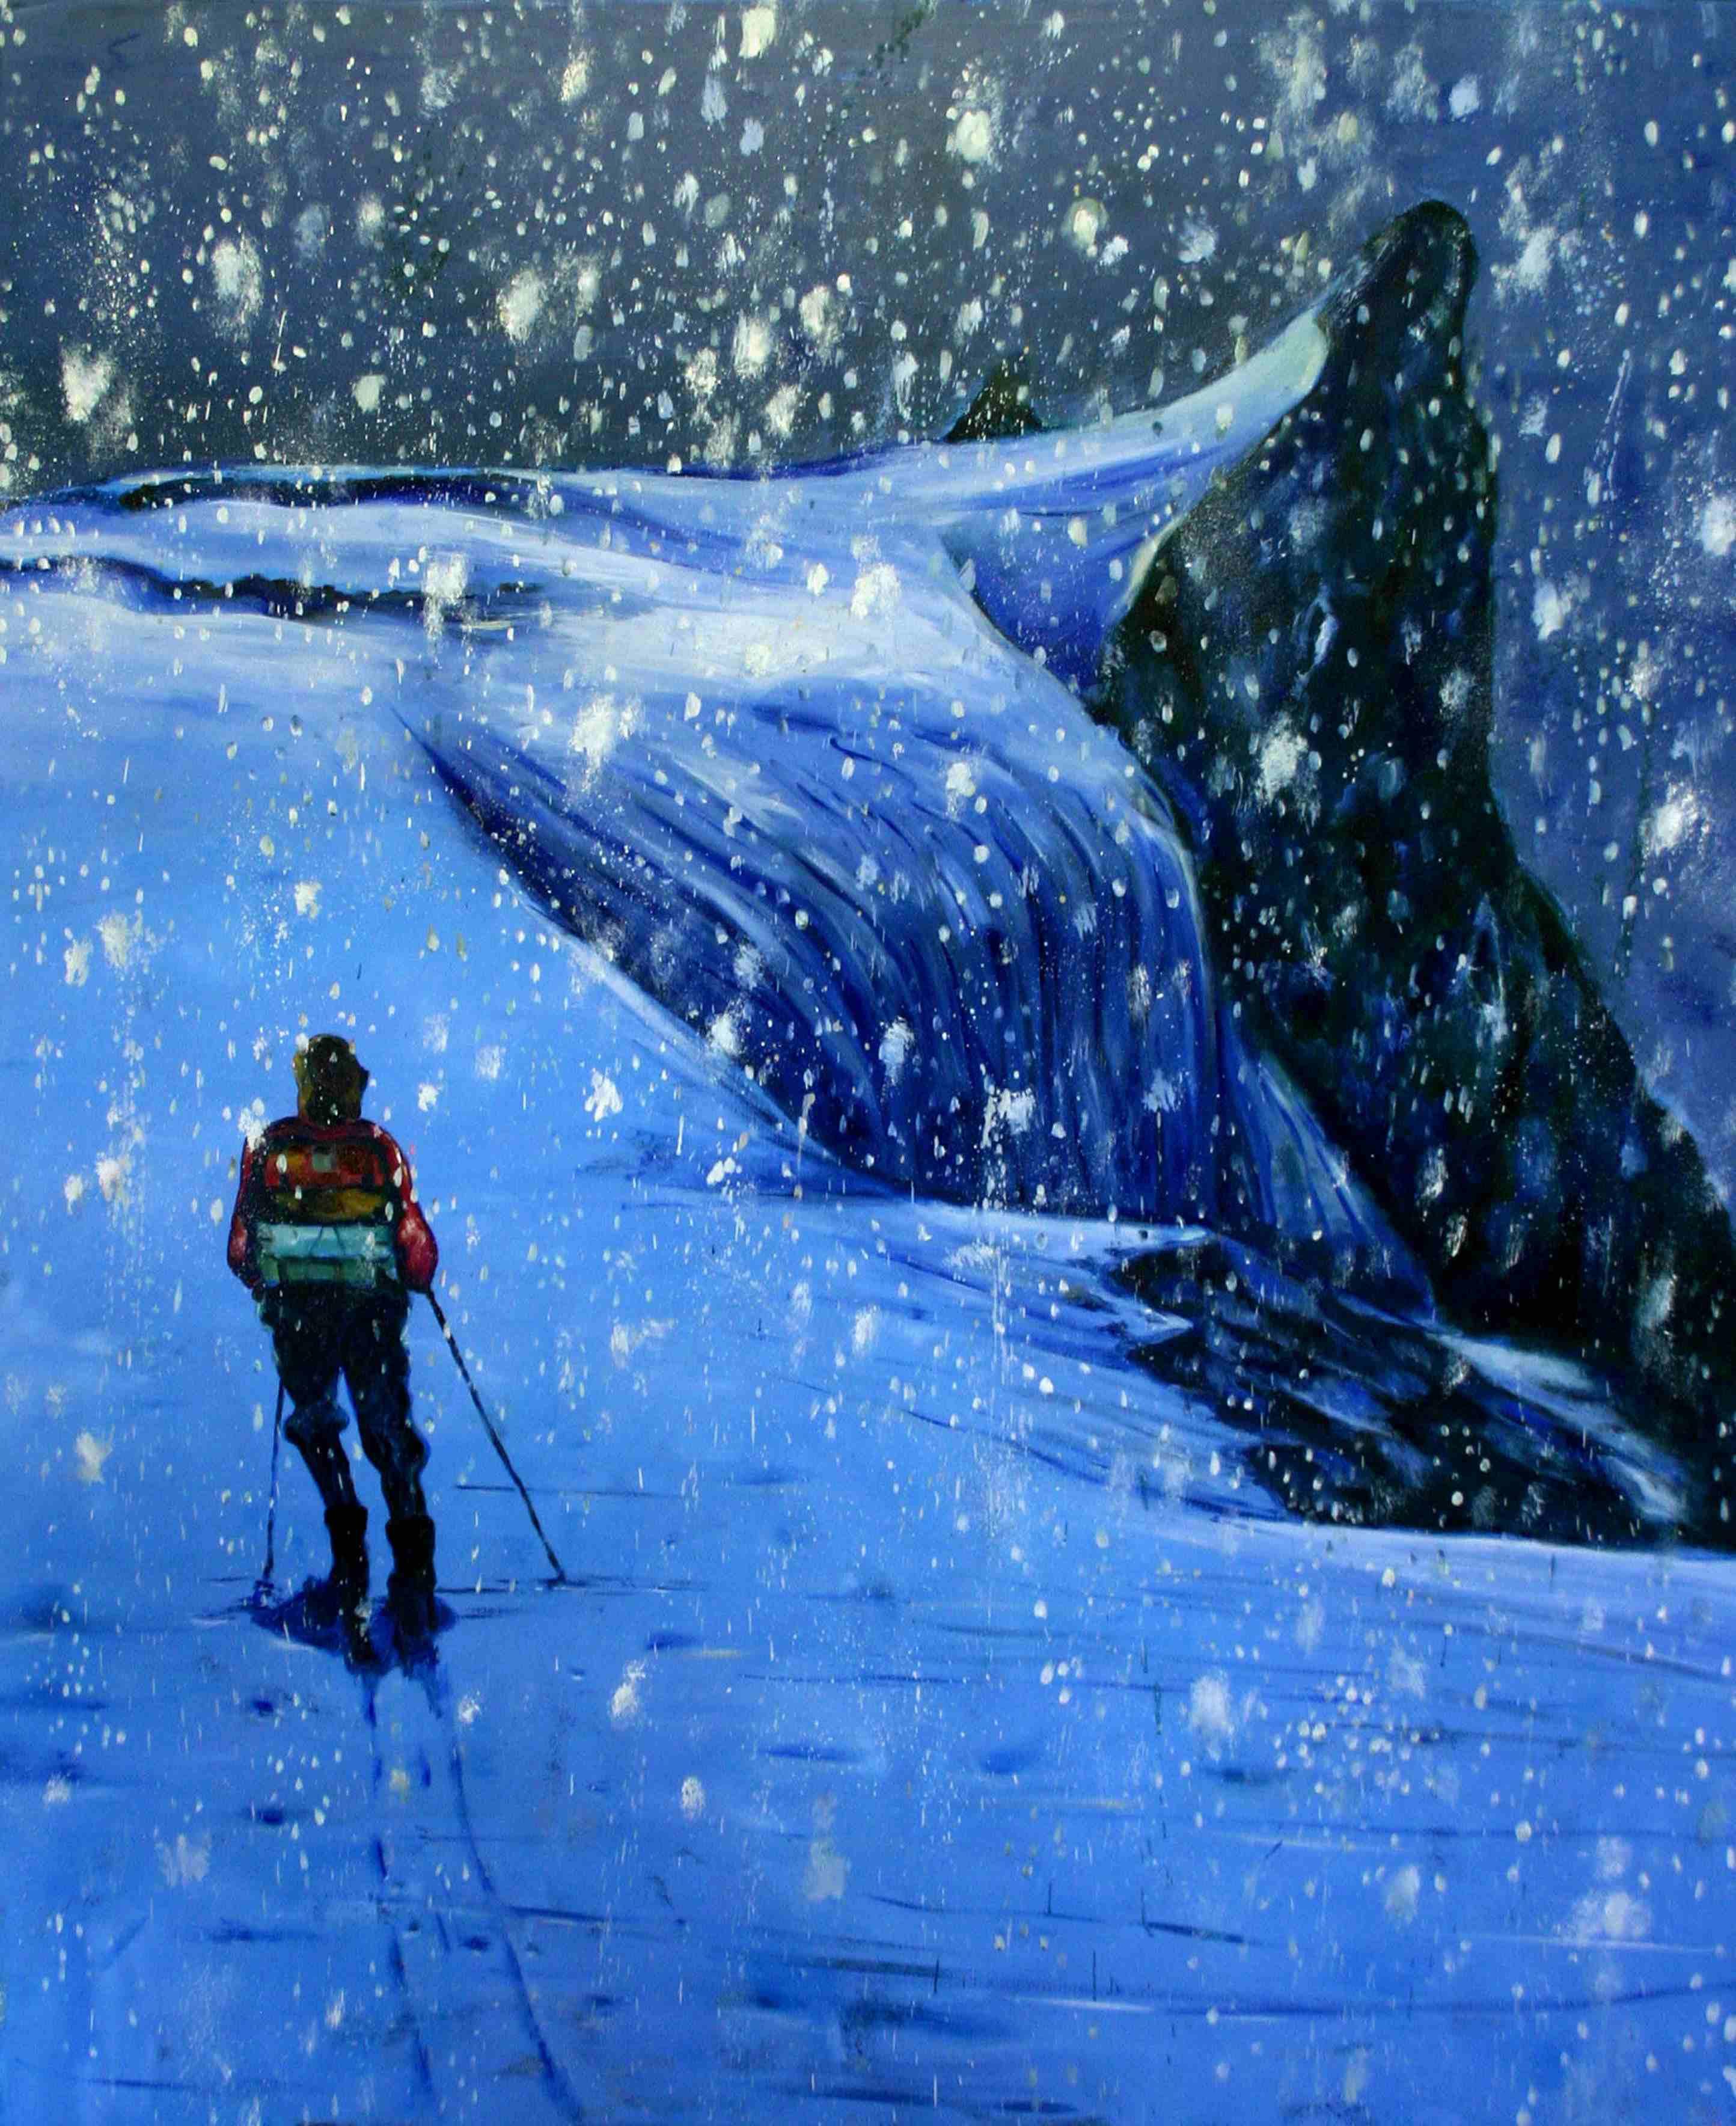 Olle Schmidt, Explorer II, 2016, oil on canvas, 145 x 120 cm